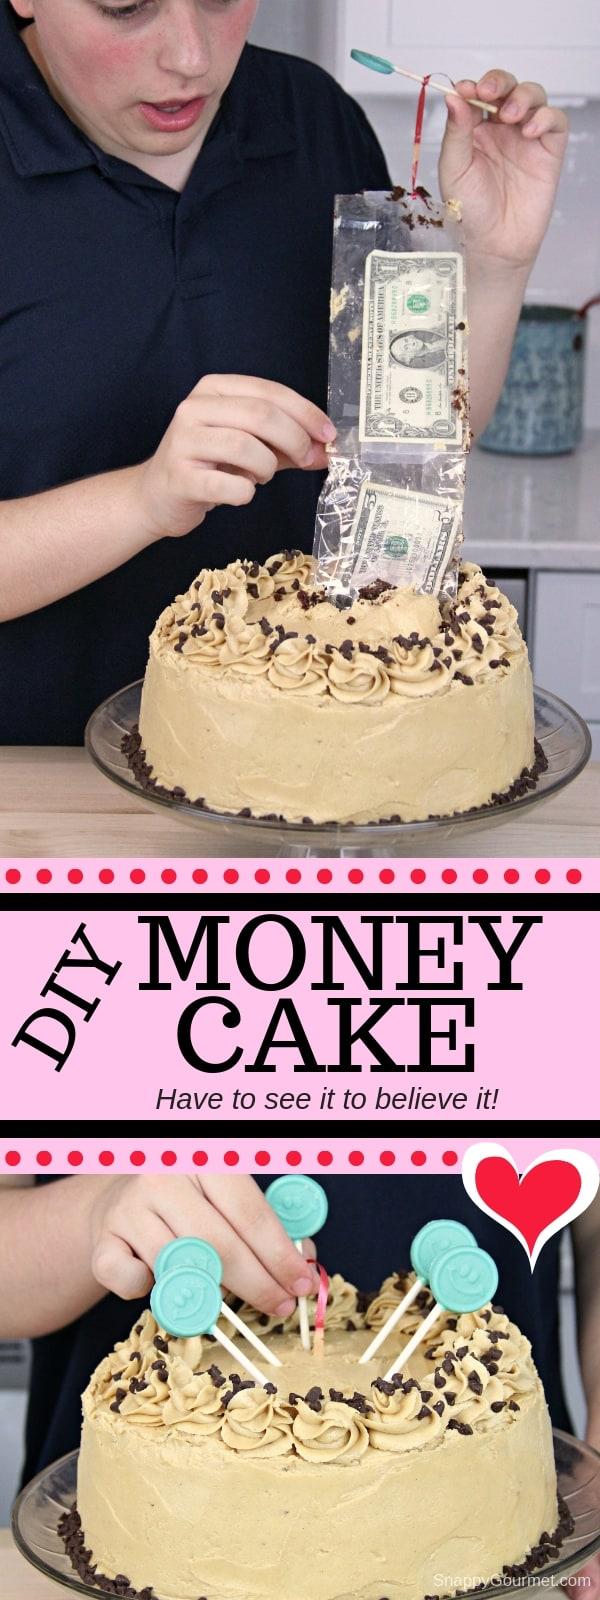 Money Cake collage